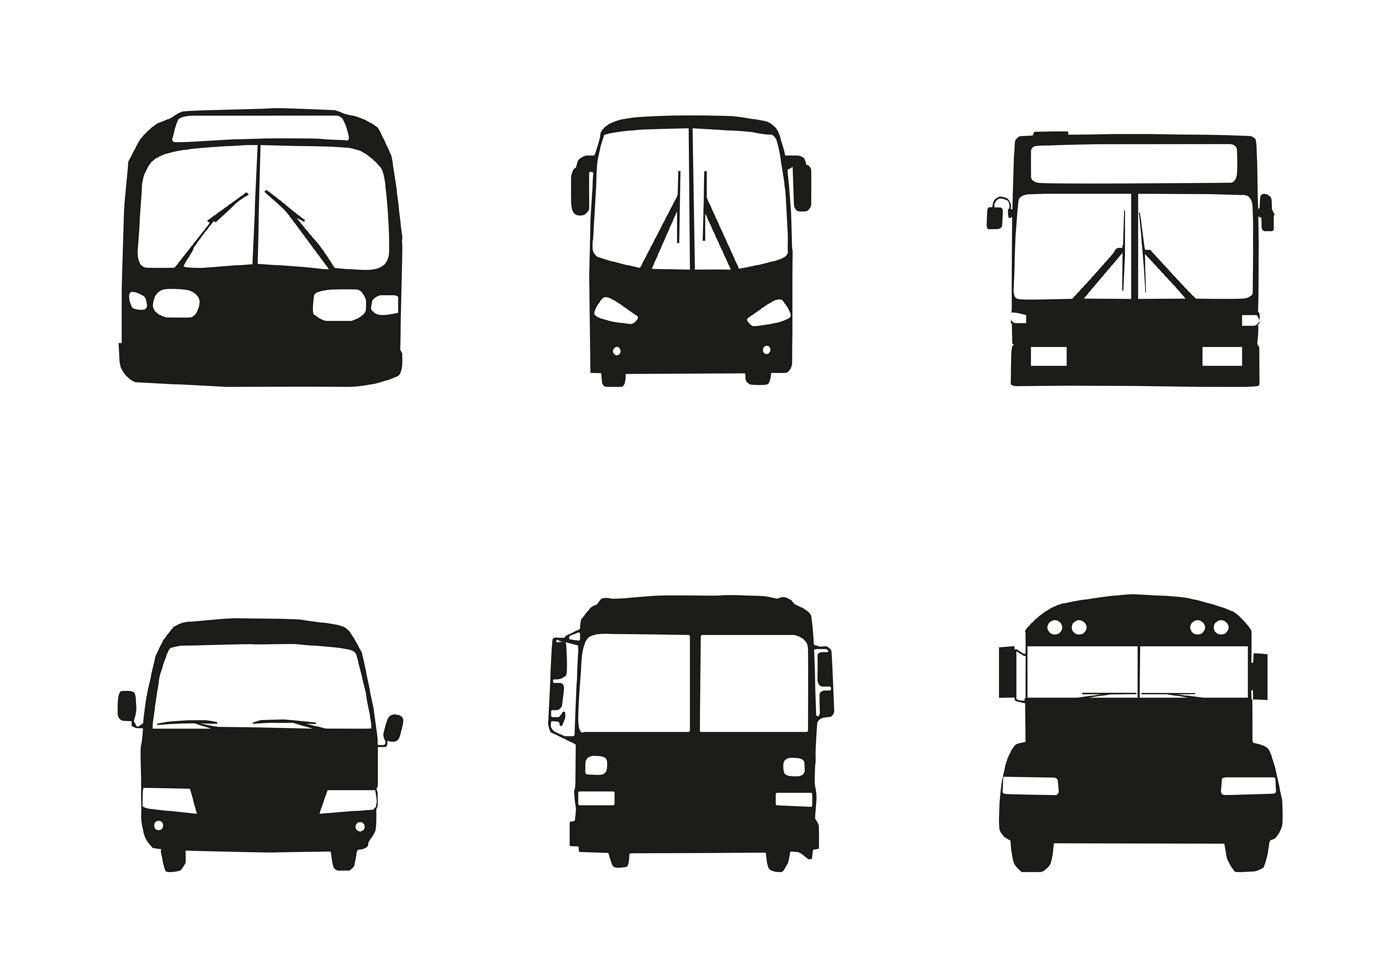 Gratis Vector Bus Car Silhouette Front